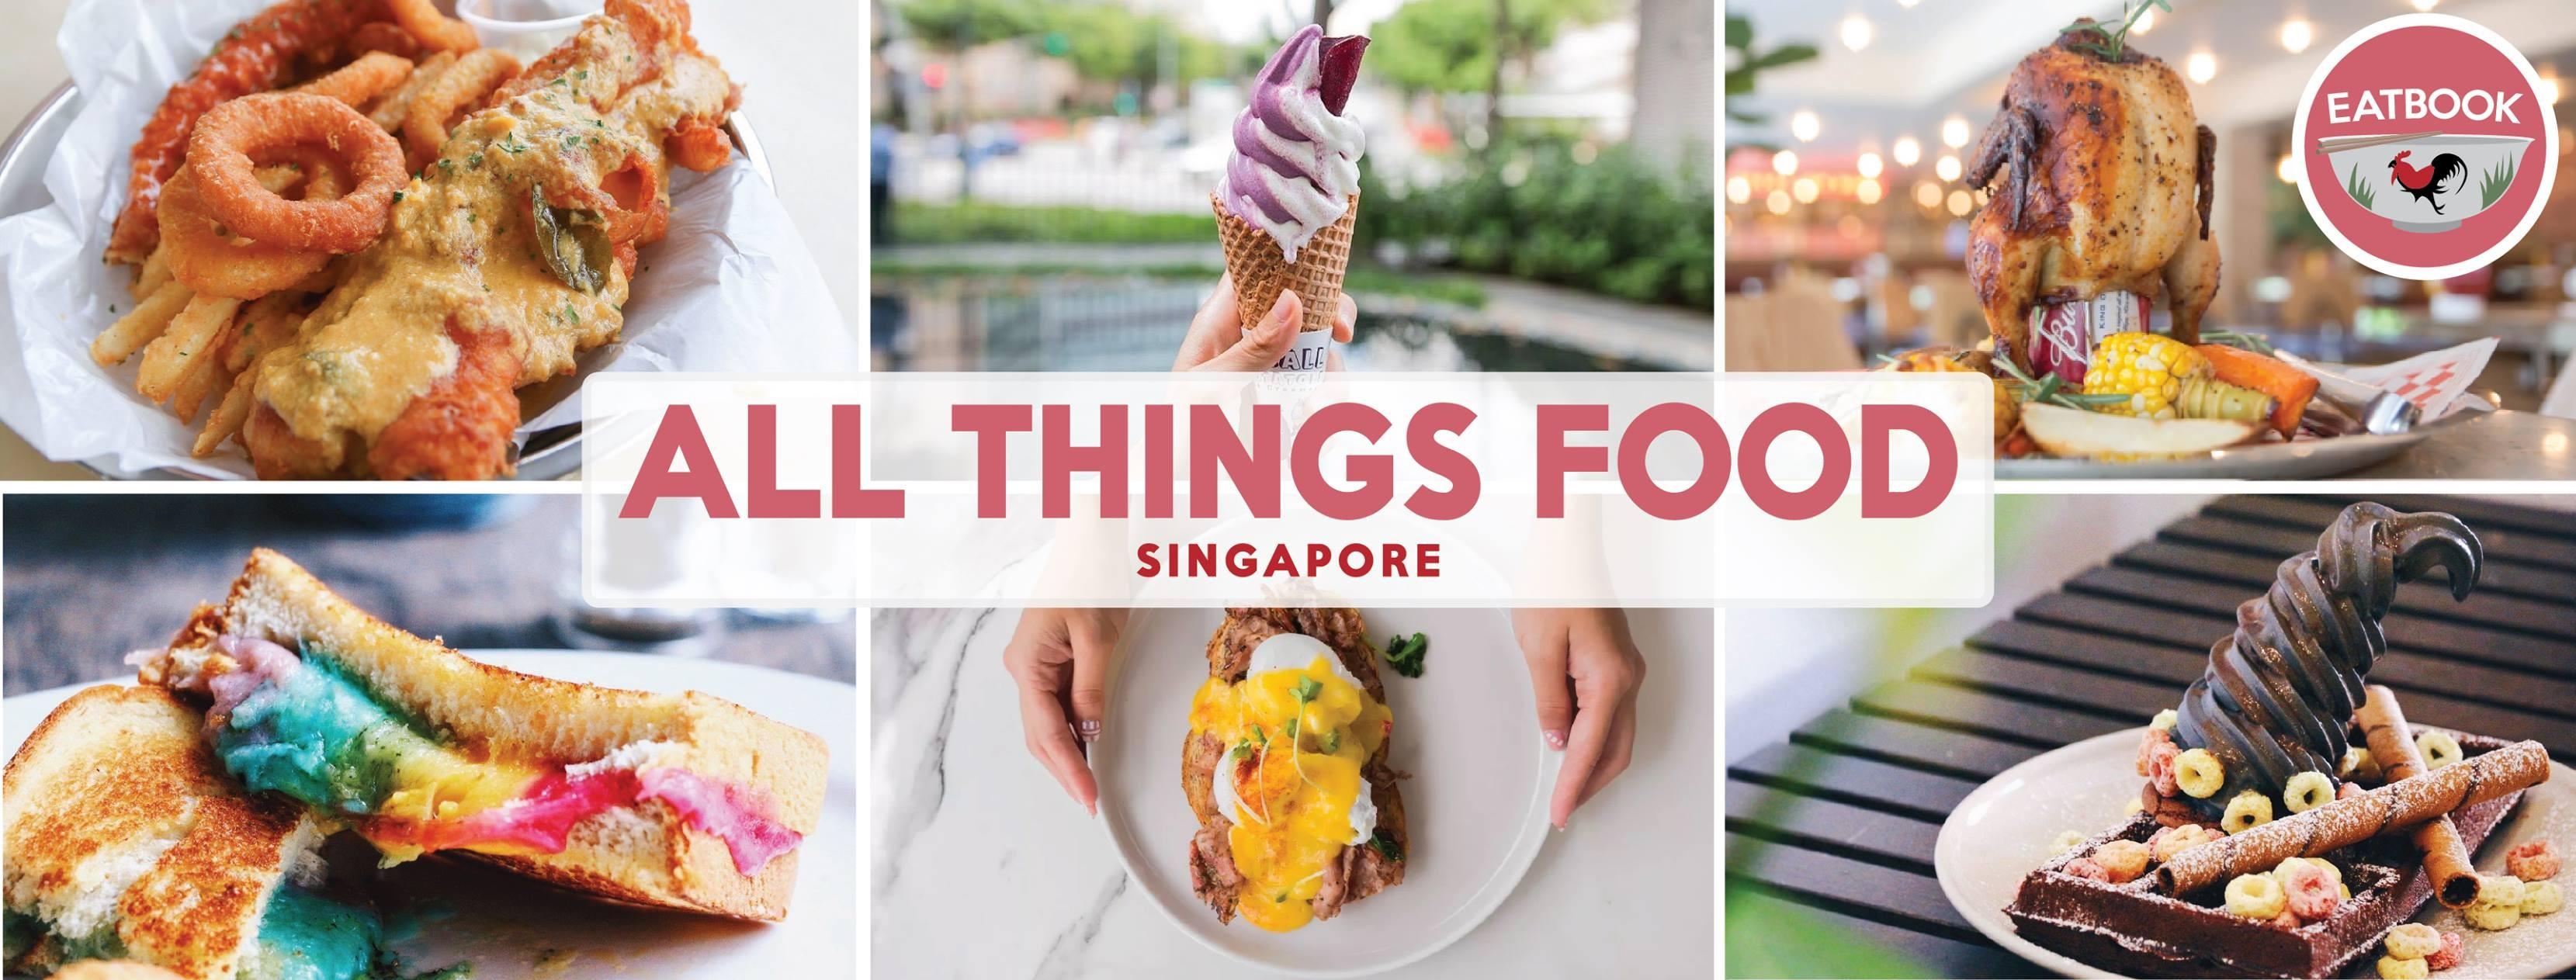 Eatbook SG | LinkedIn